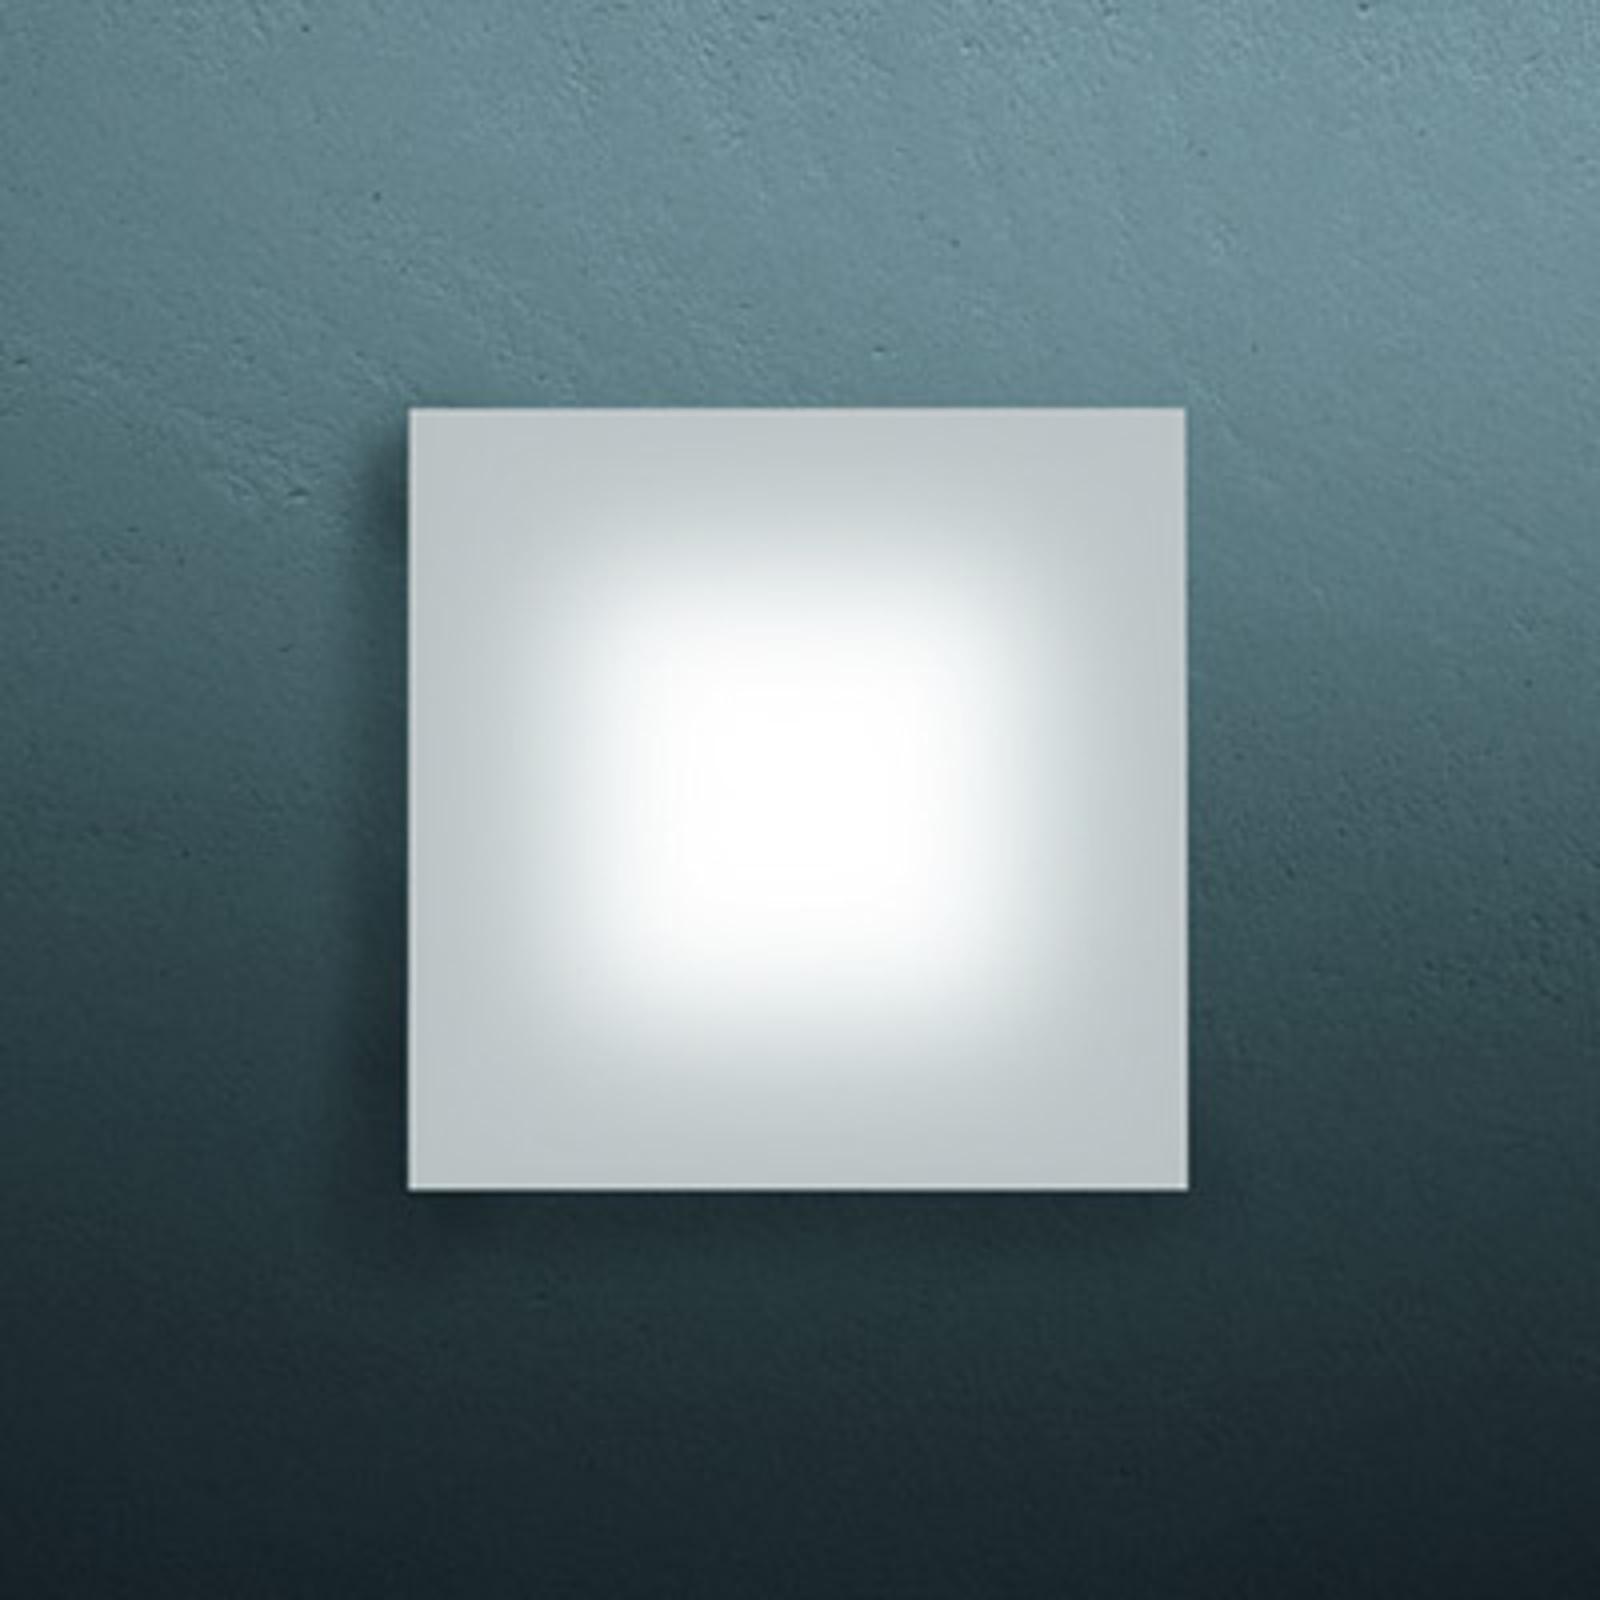 Superpłaska lampa sufitowa LED SOLE 12 cm